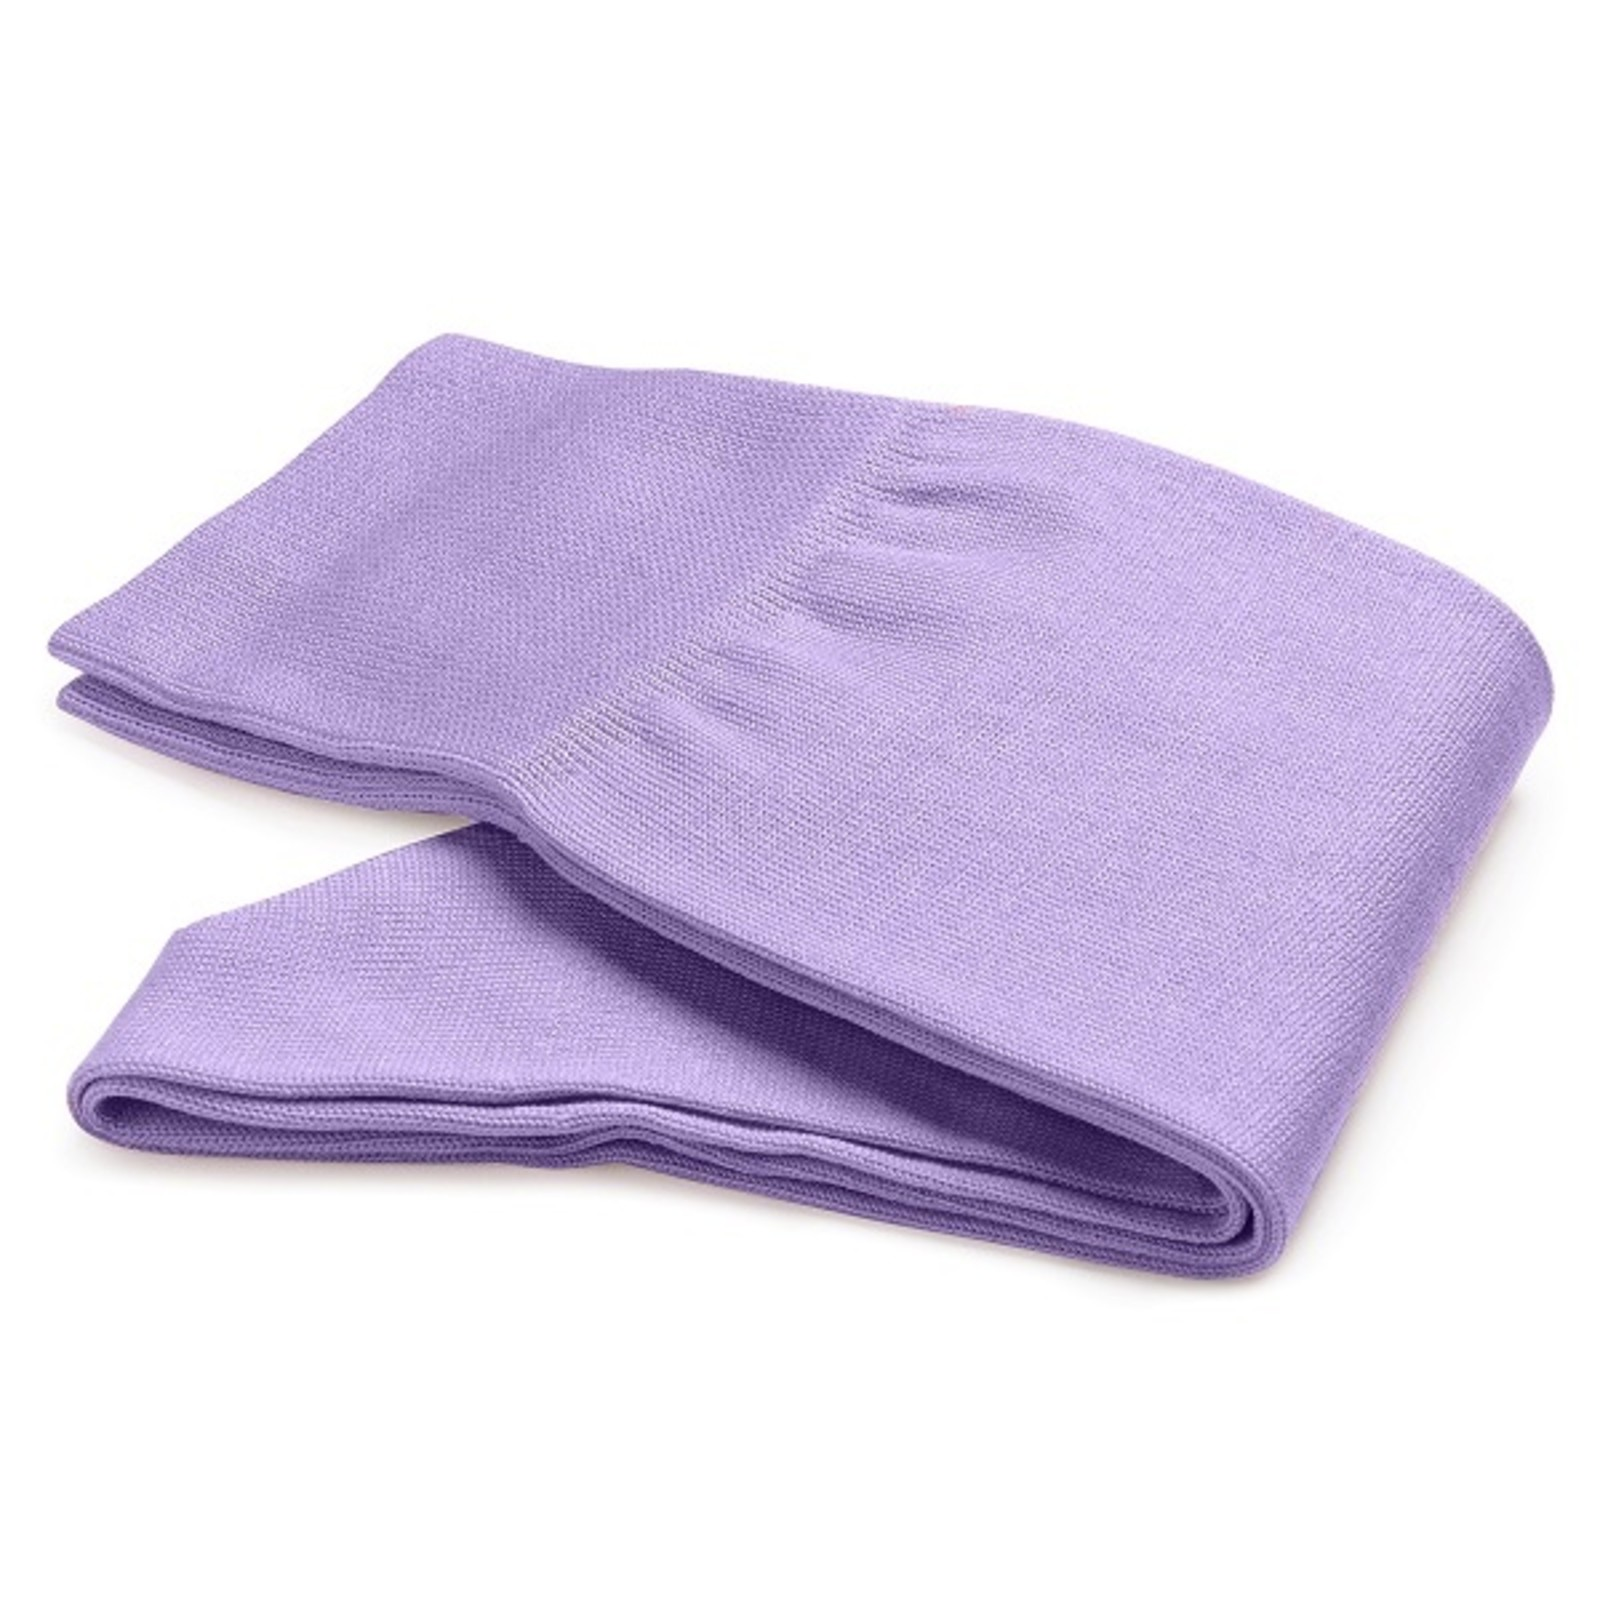 Carlo Lanza Violet cotton socks